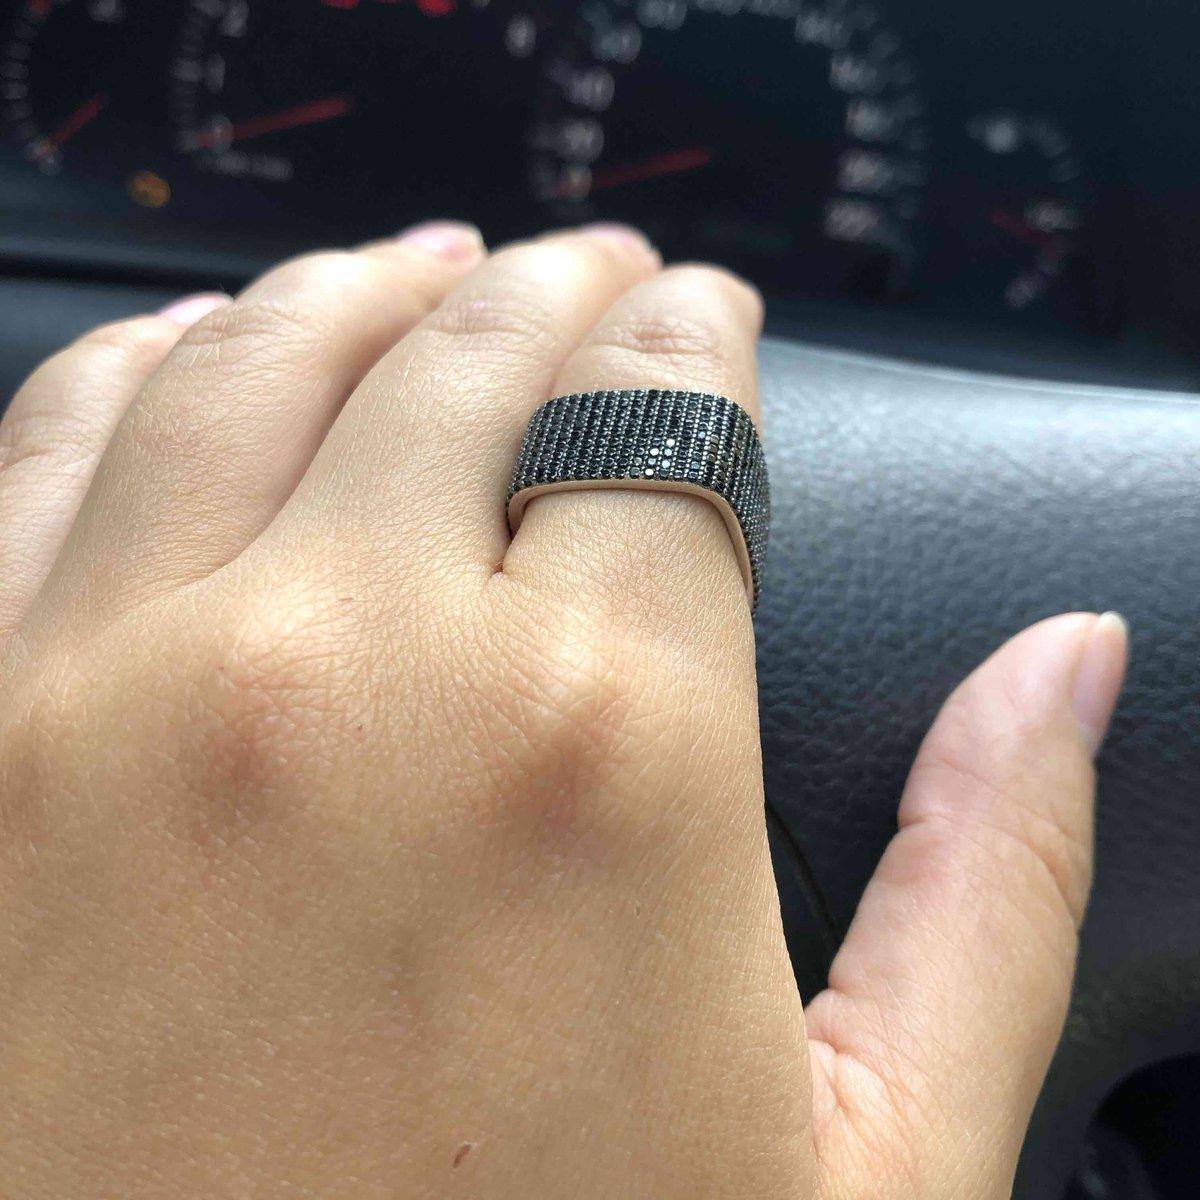 Кольцо потрясное.